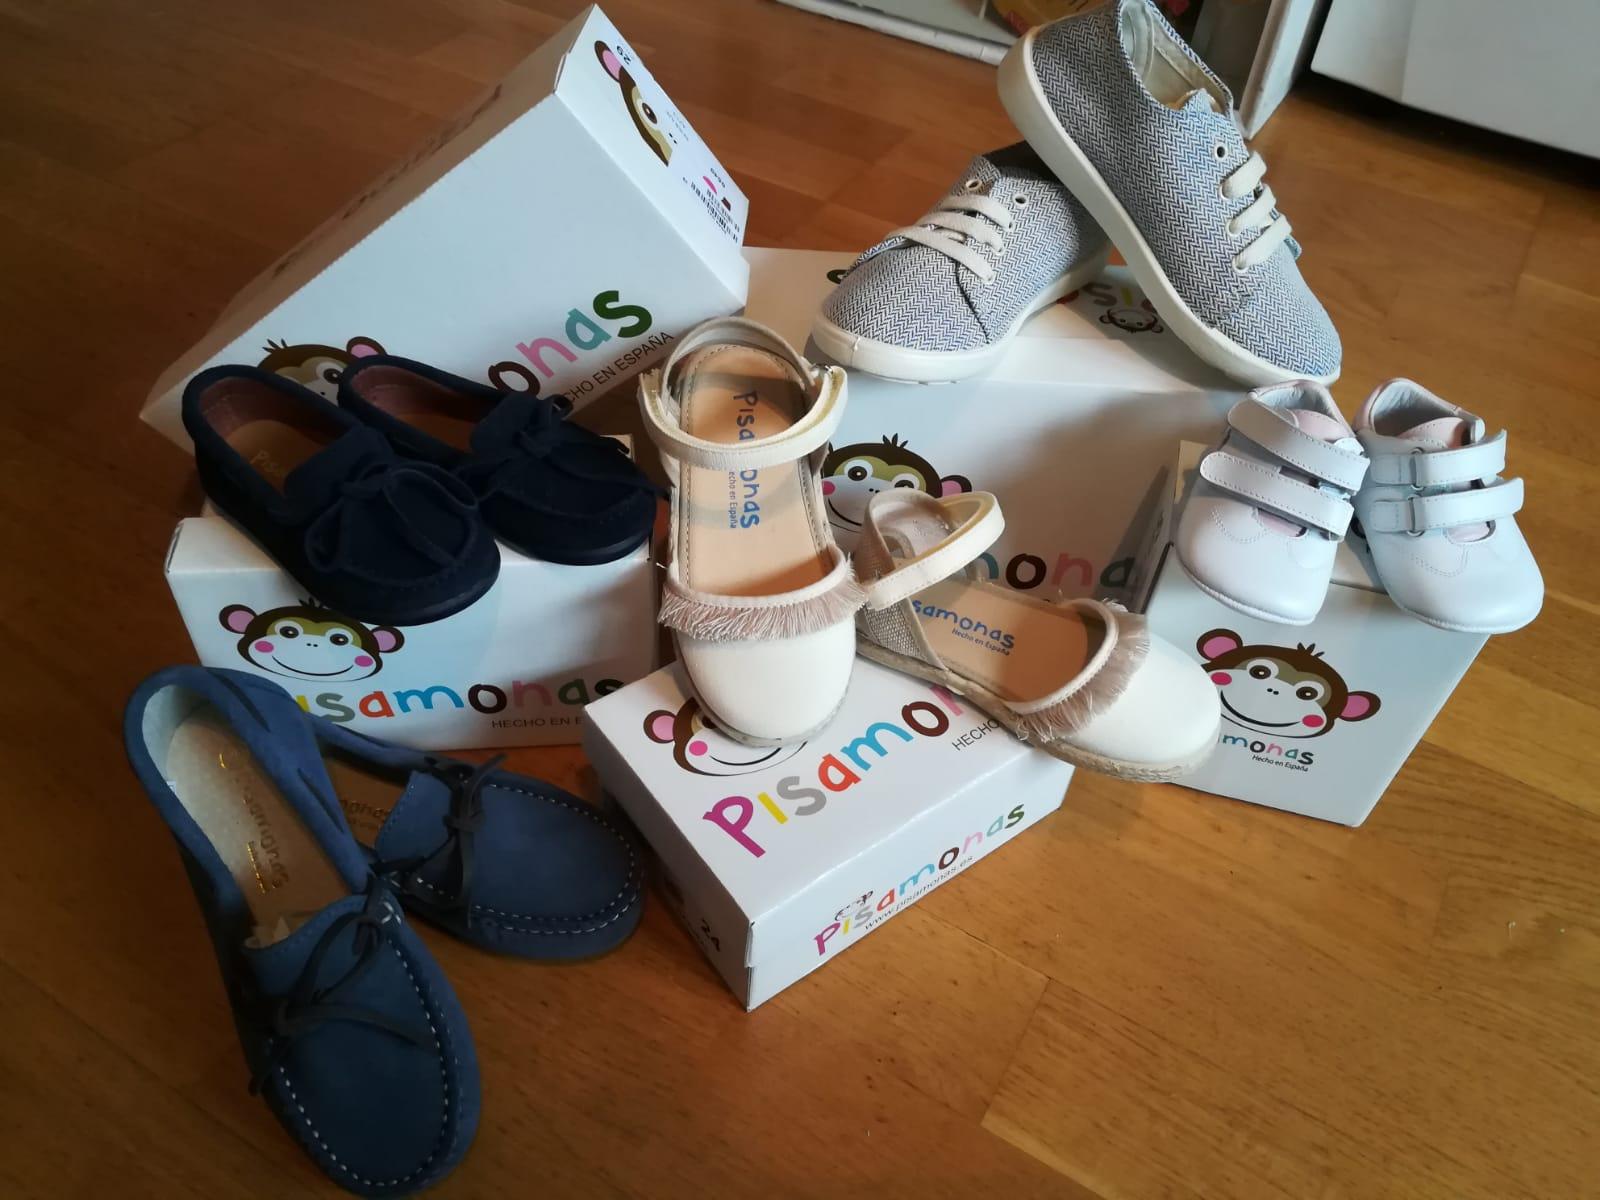 calzado infantil3 - Novedades en calzado infantil Pisamonas primavera-verano 2018